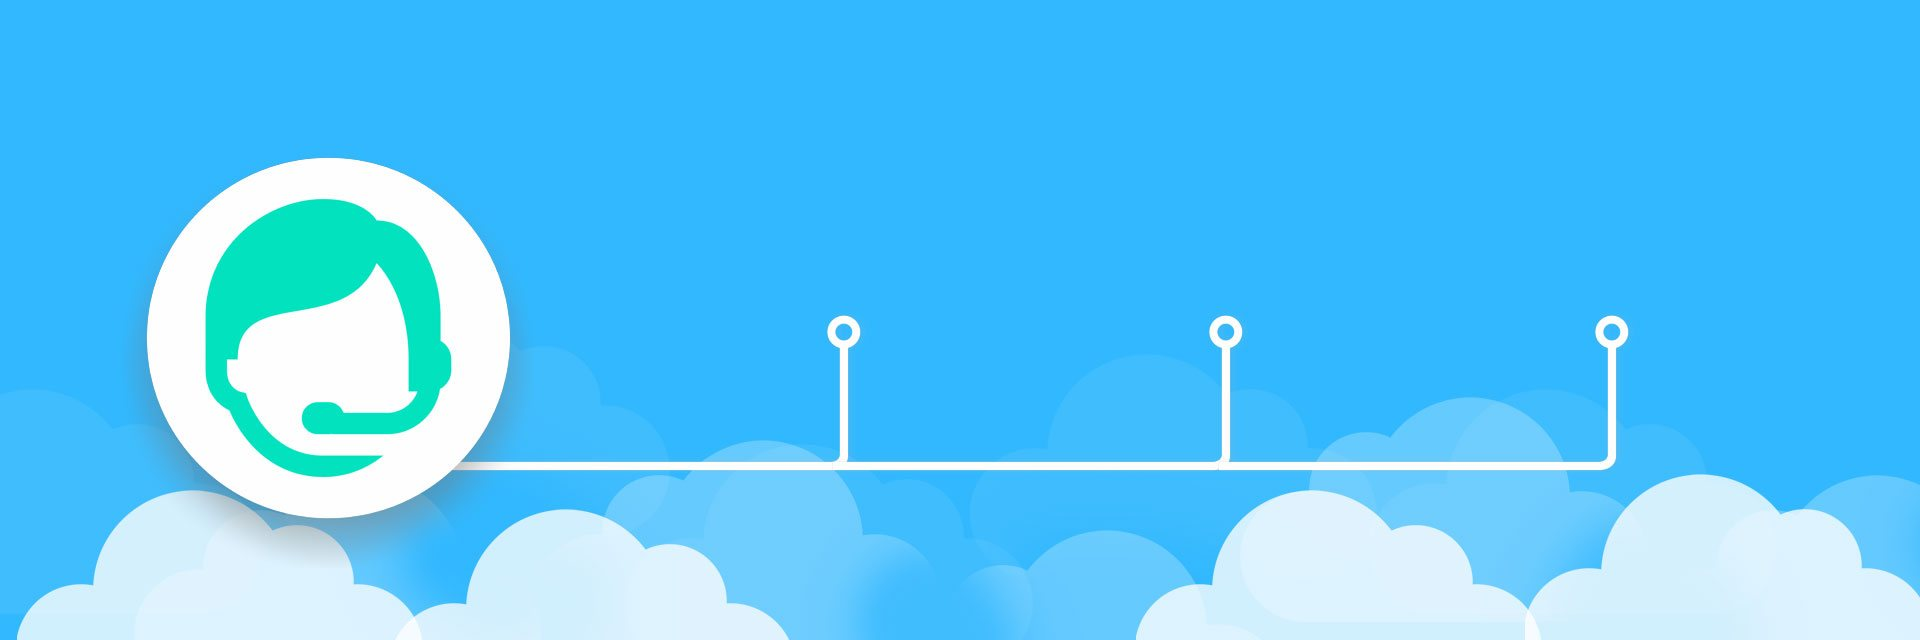 24*7 Google Cloud Platform